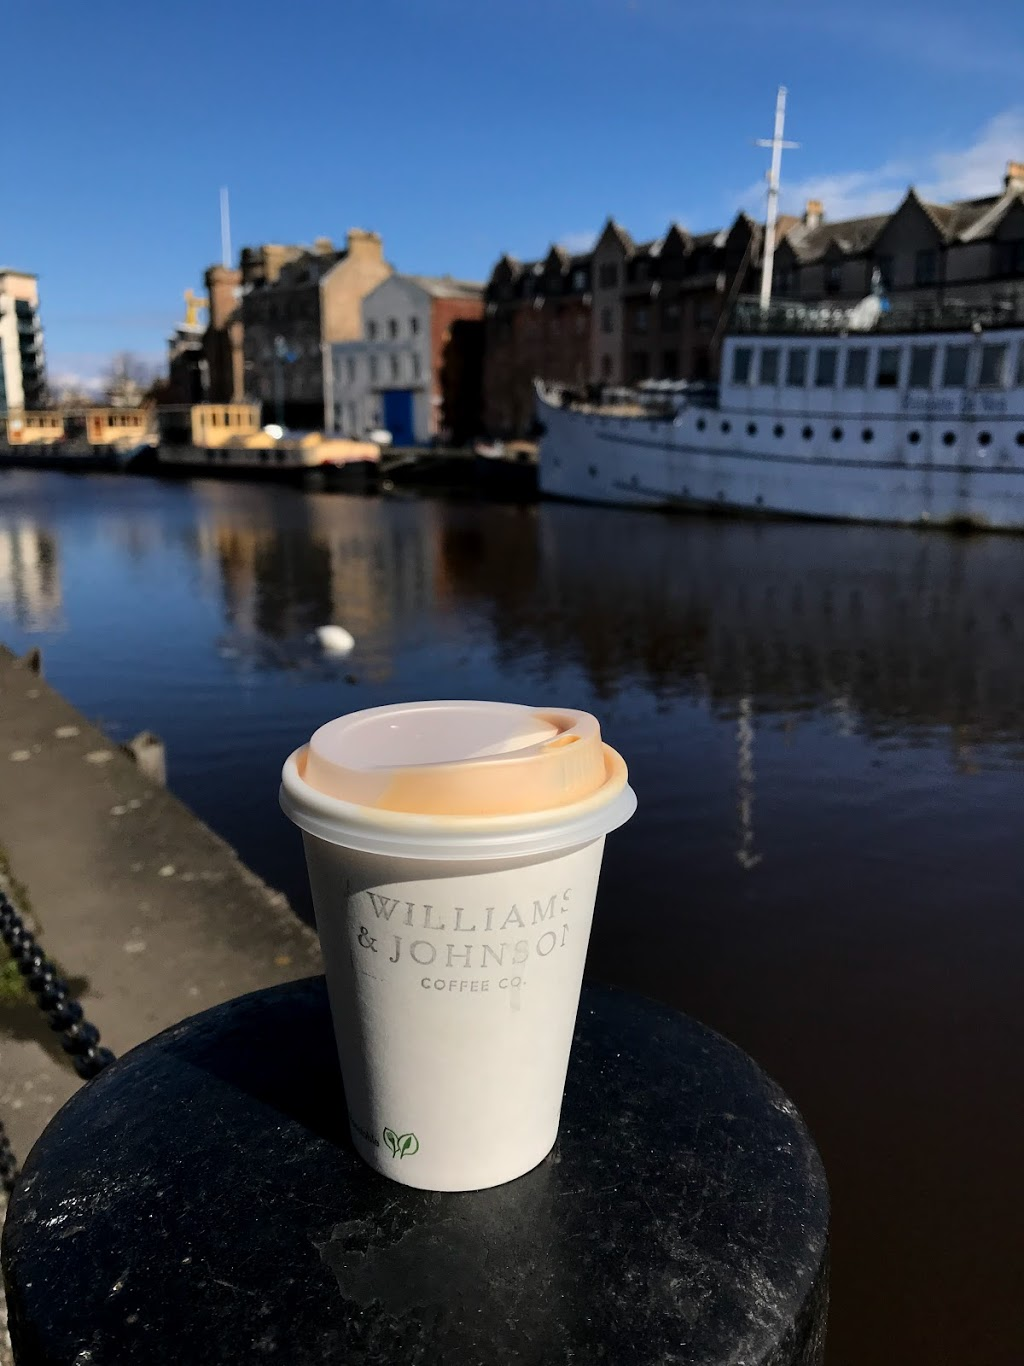 Edinburgh - 1. Williams & Johnson Coffee Co.2. Lowdown Coffee3. Century General Store & CafeFull Edinburgh City list here.